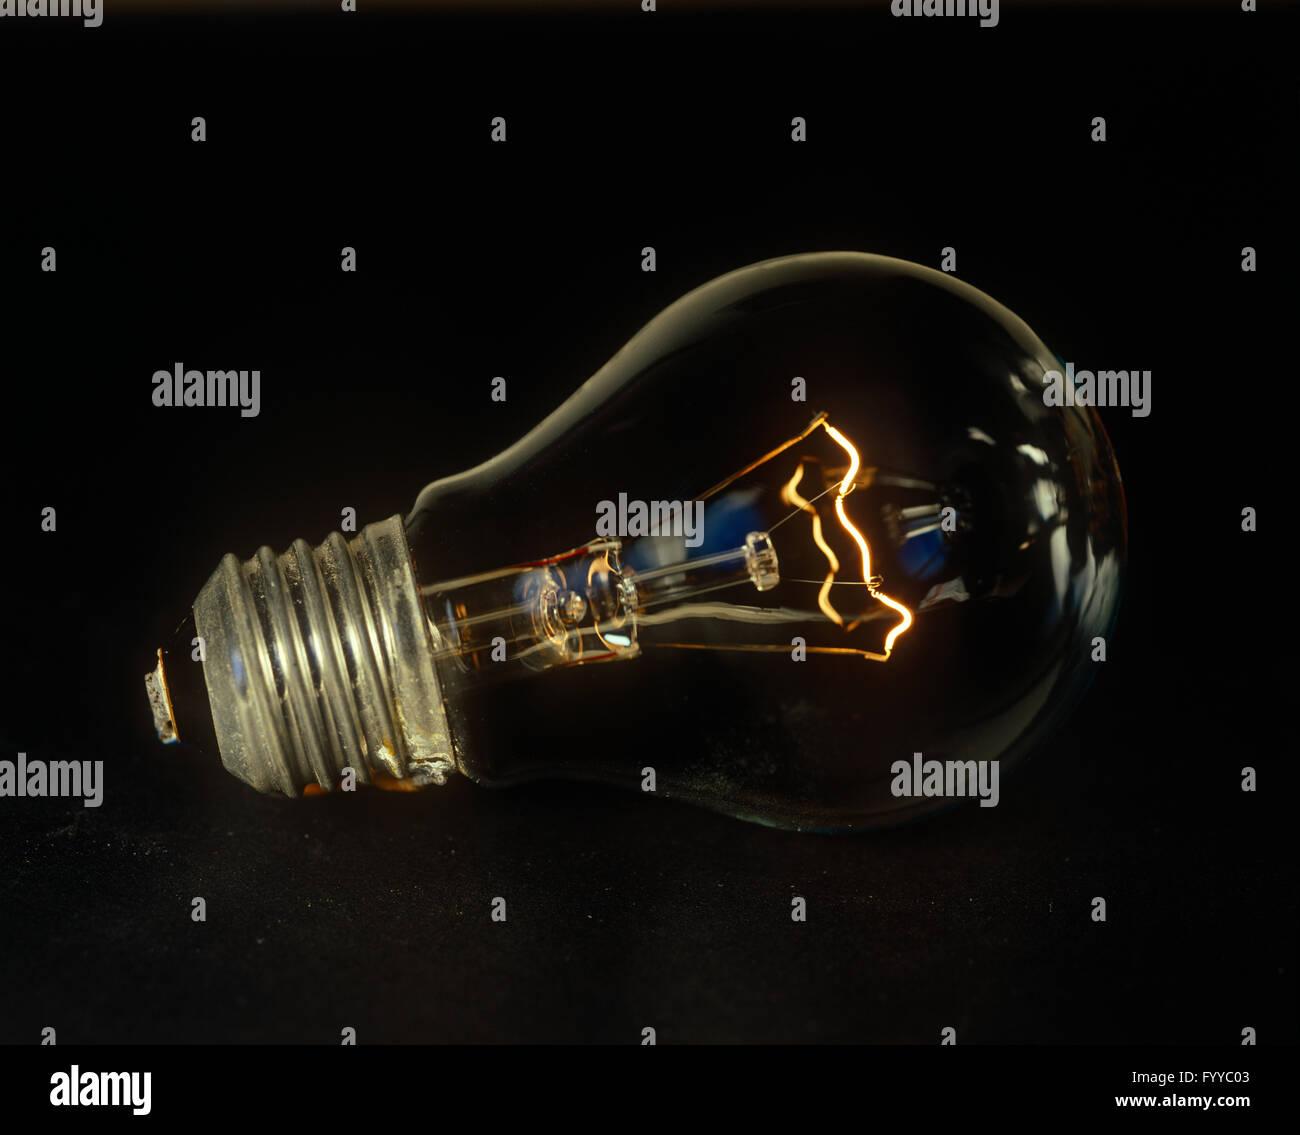 Close-up of a light bulb, inside. - Stock Image